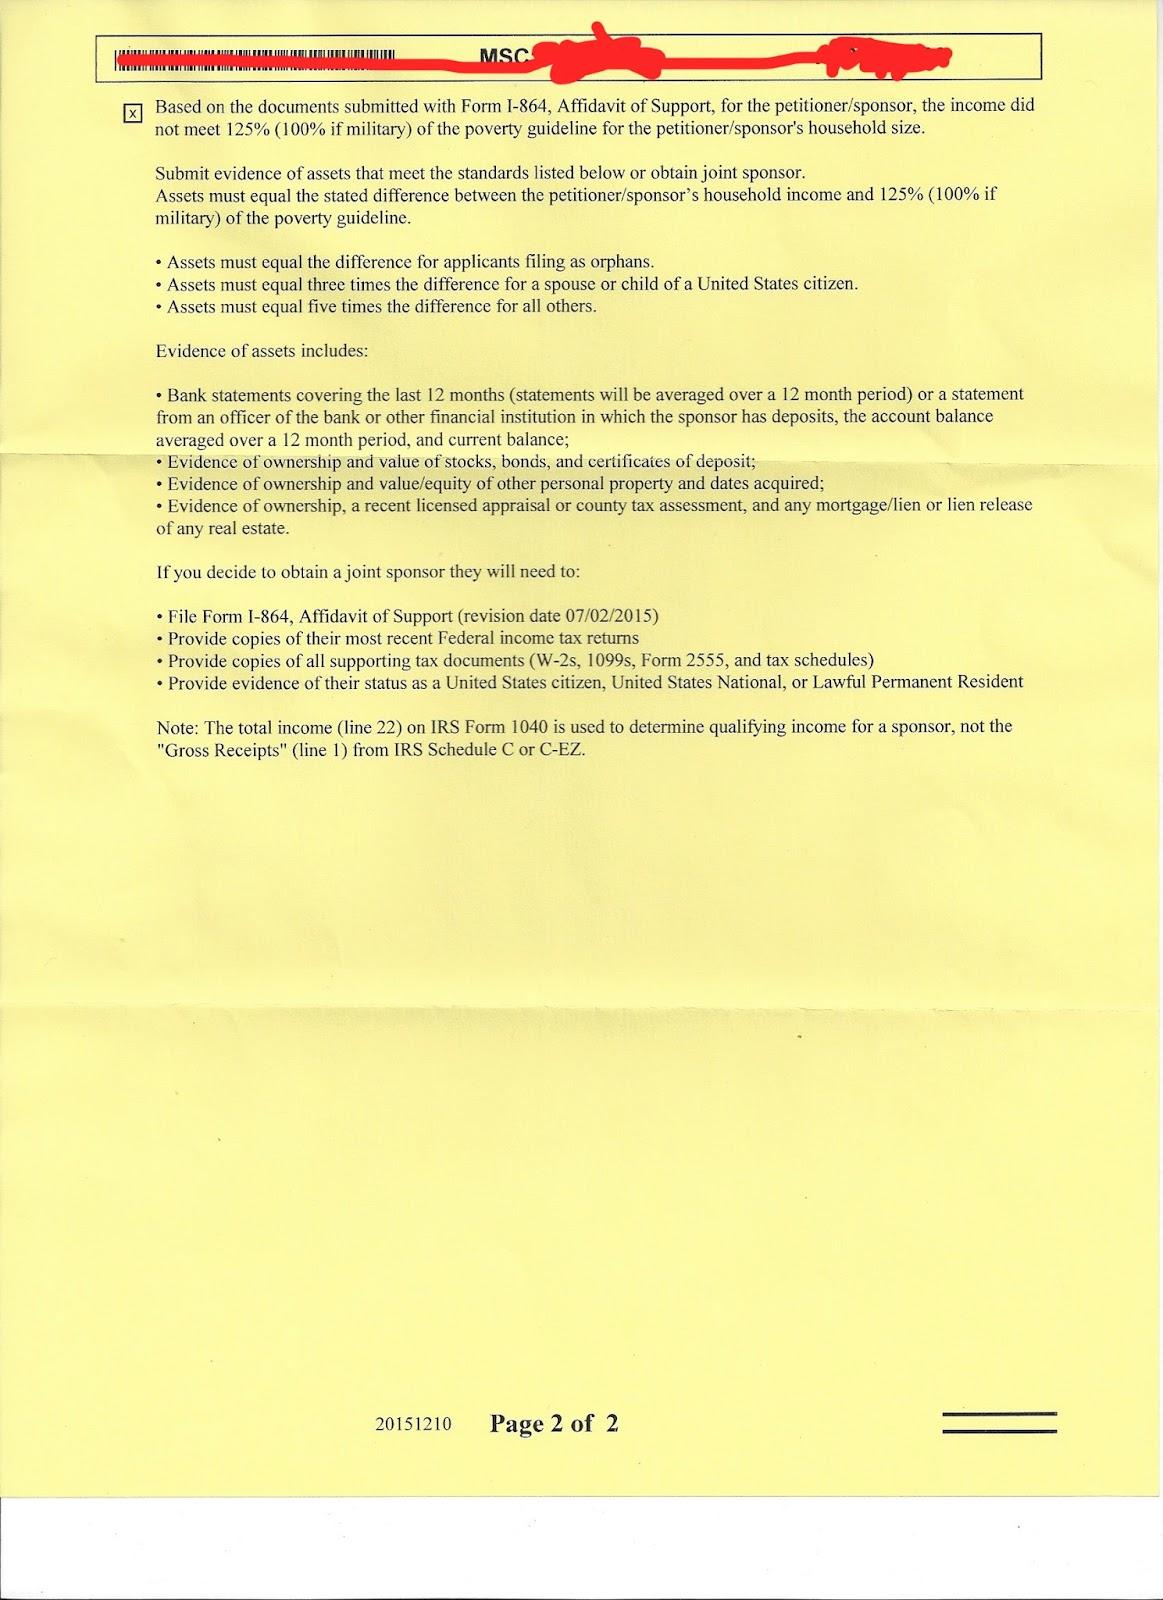 Uscis Letter Viewletter Co